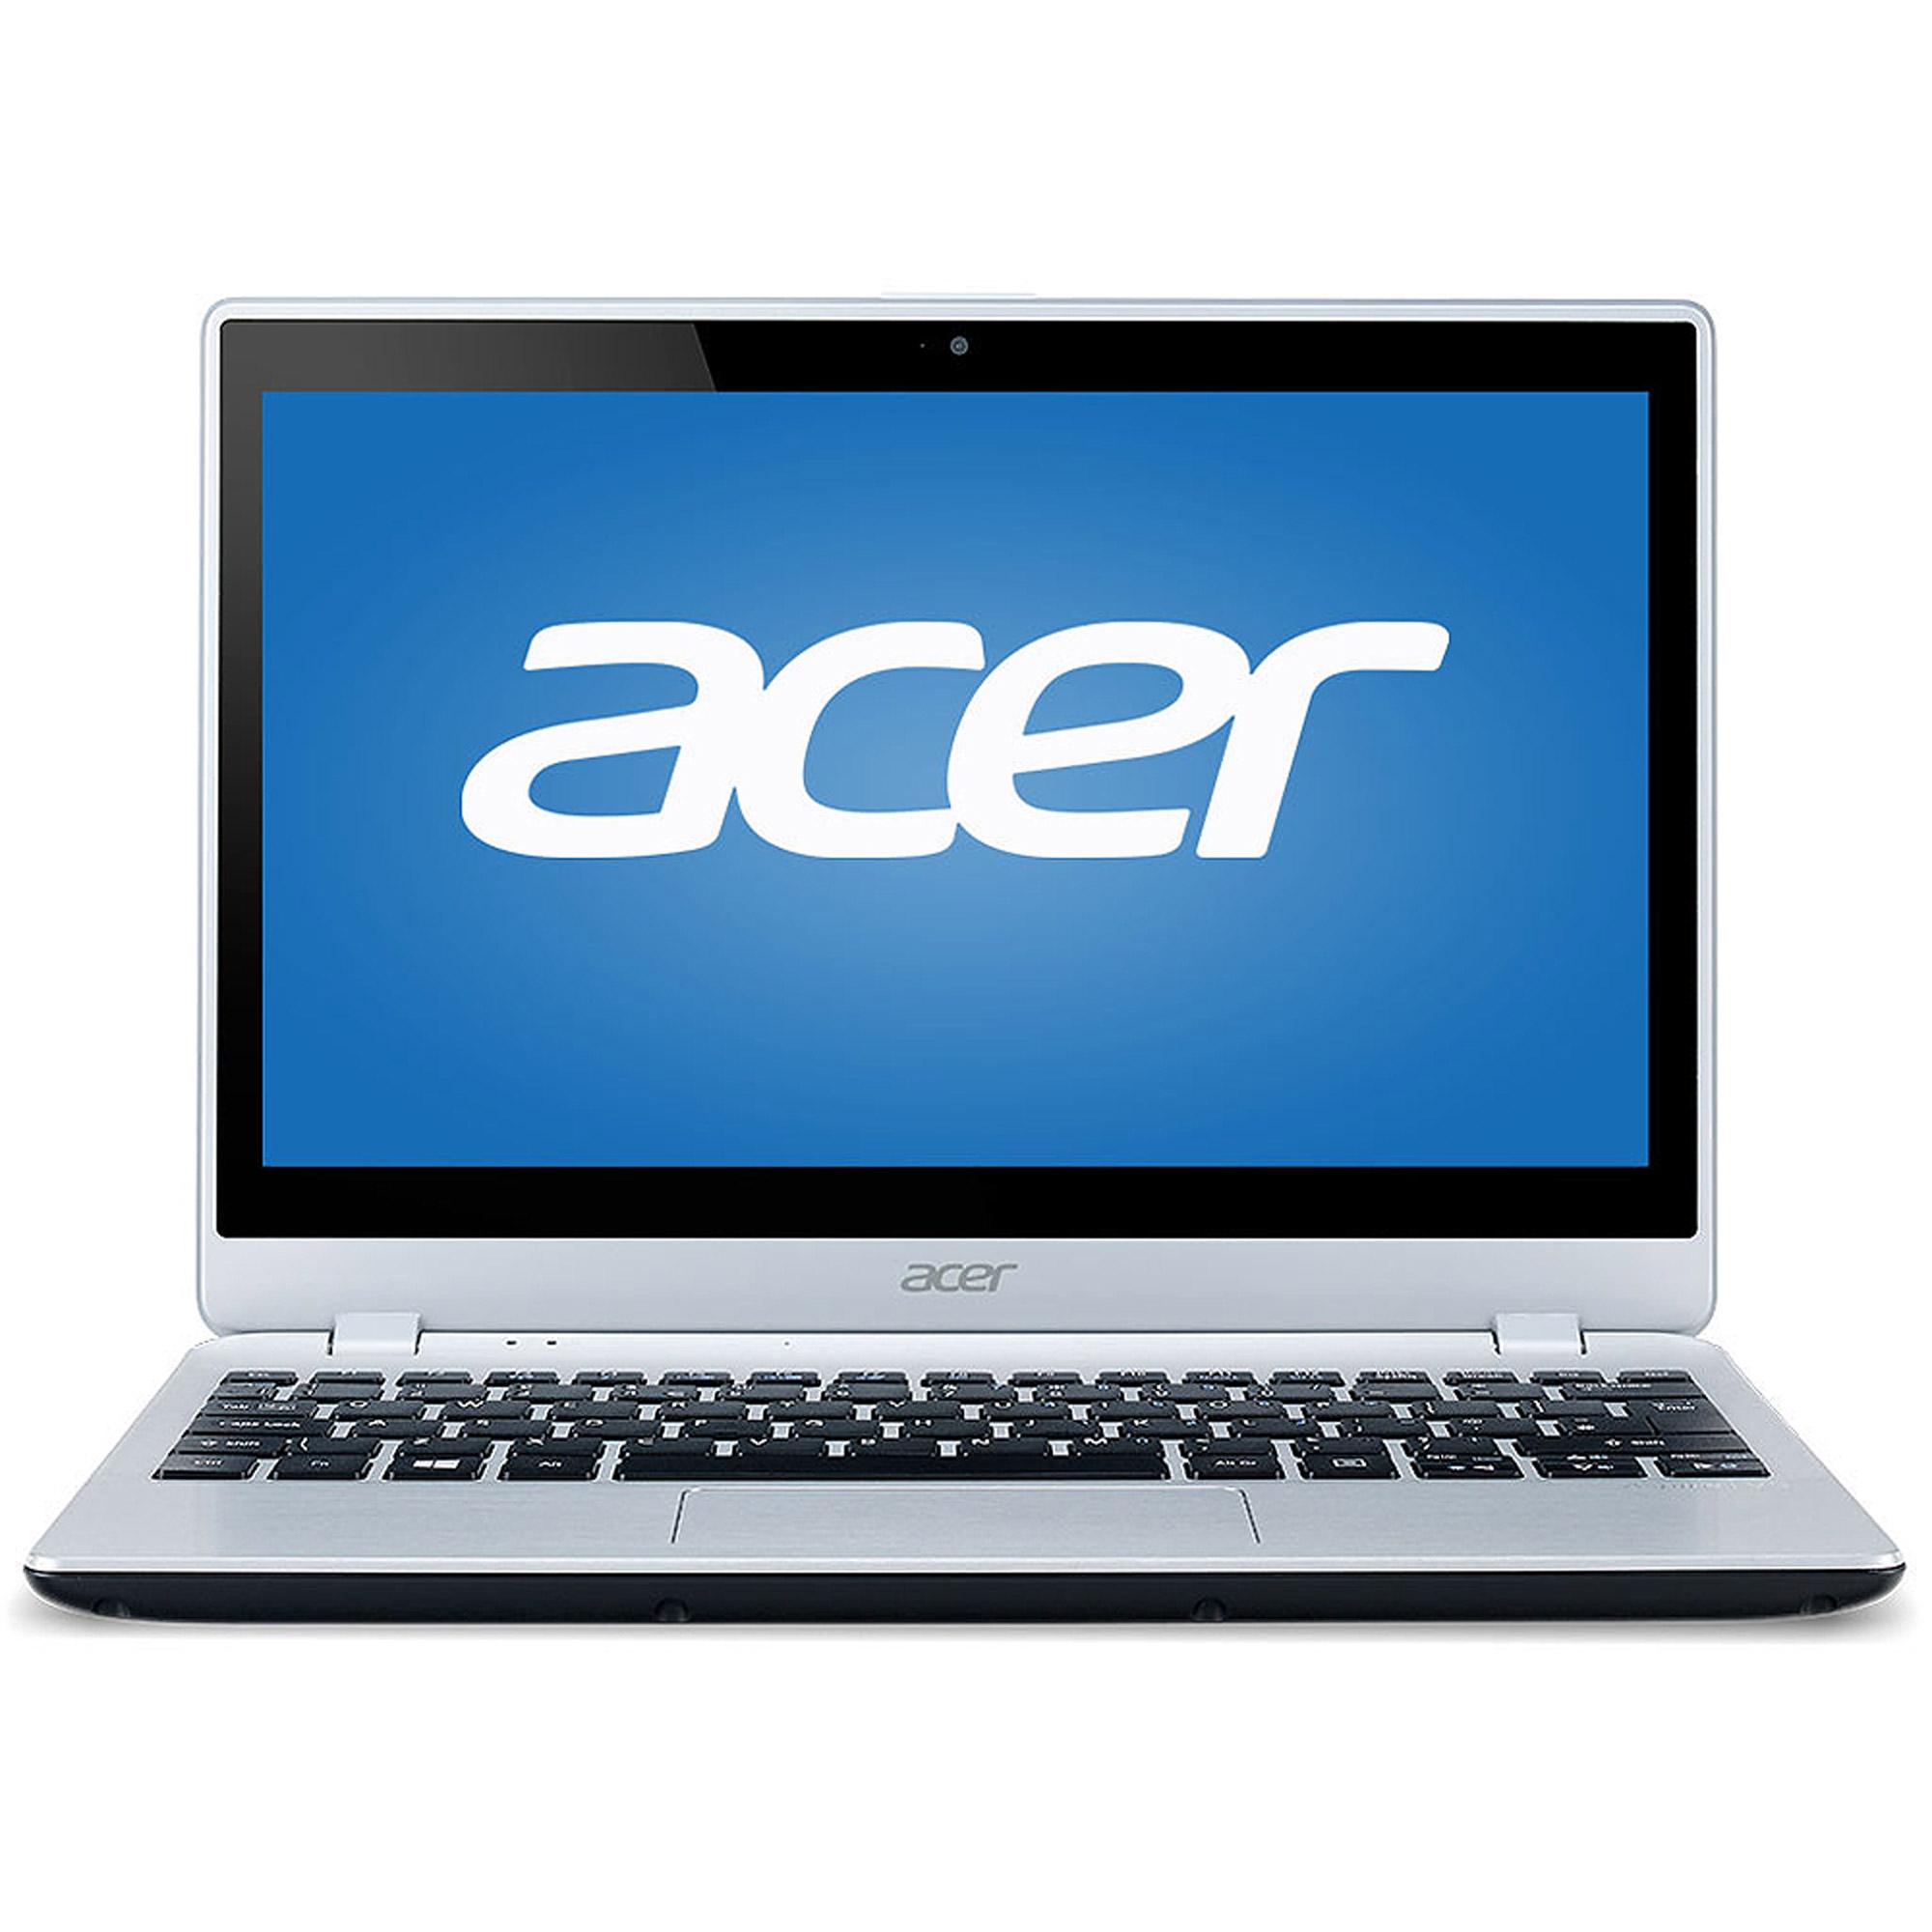 "Acer Aspire V5-122P-0408 X2 AMD A4-1250 1.0GHz 4GB 500GB 11.6"" Touch Win8 (Ch, Silver (Refurbished)"